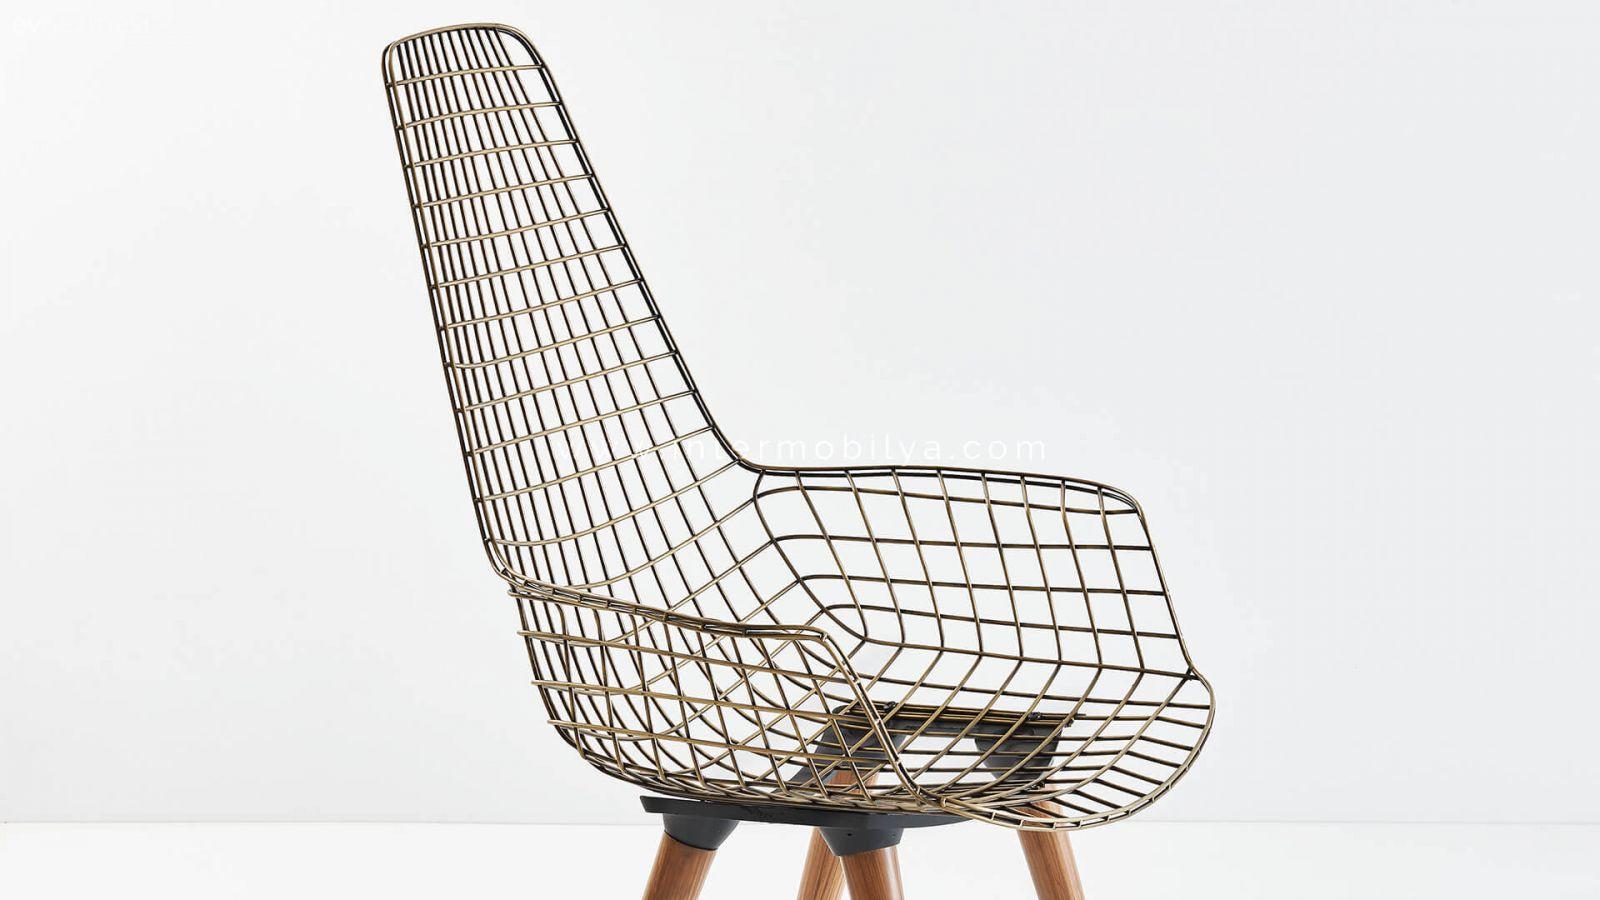 Related pictures gri tasar m 3d duvar kaplama rnekleri yaz s i in lk - Uzun Zira Tel Sandalye Modeli Nter Mobilya